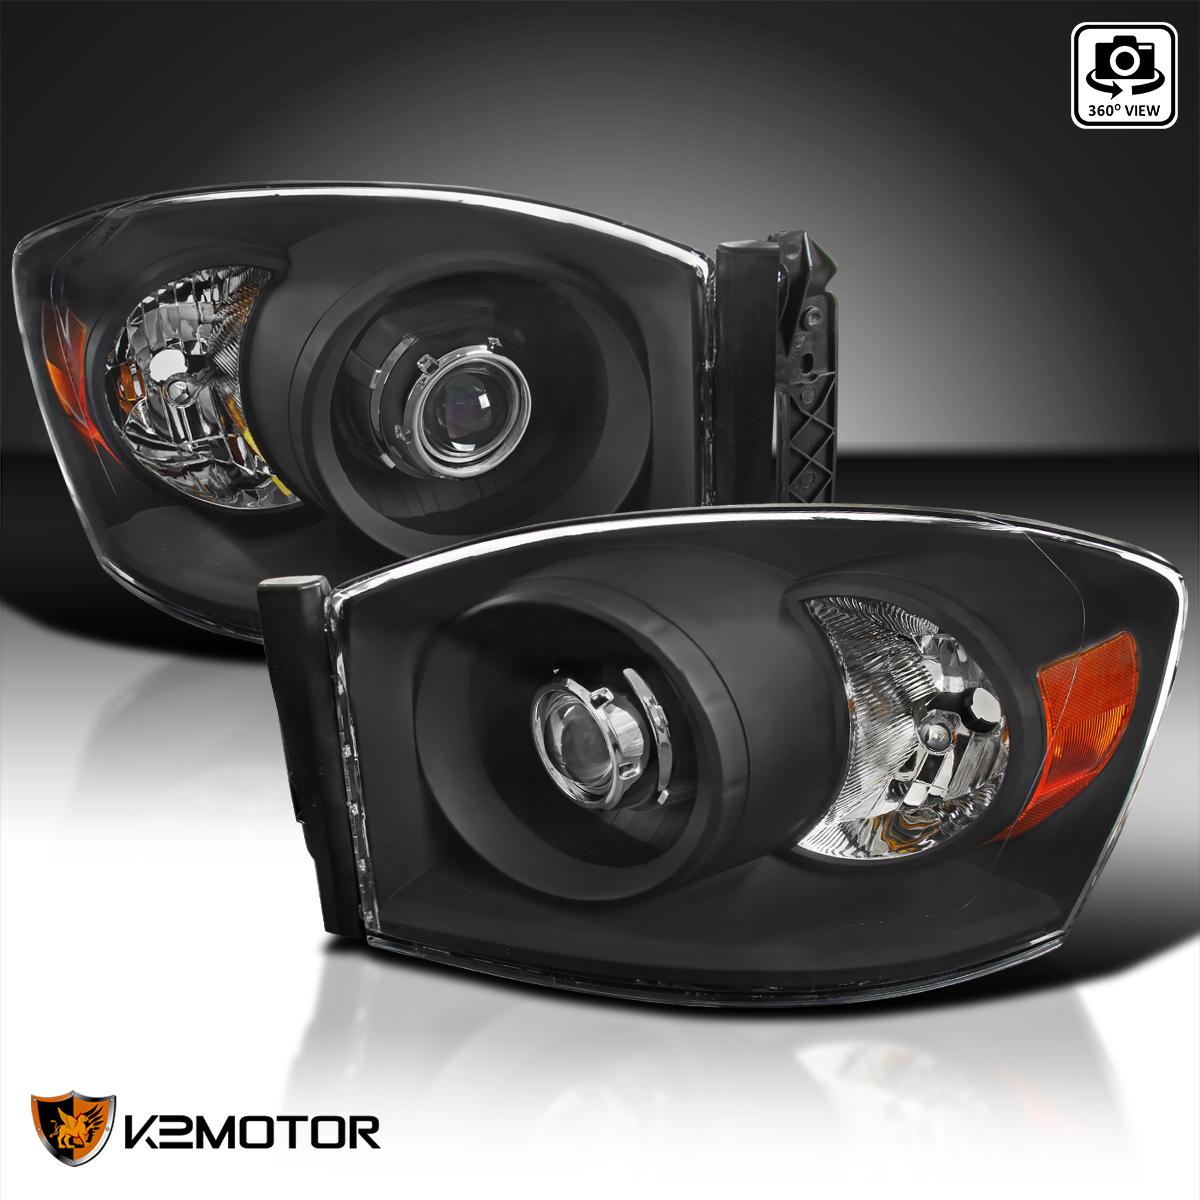 Details about Black 2006-2008 Dodge Ram 1500 2500 3500 Retrofit Style  Projector Headlights